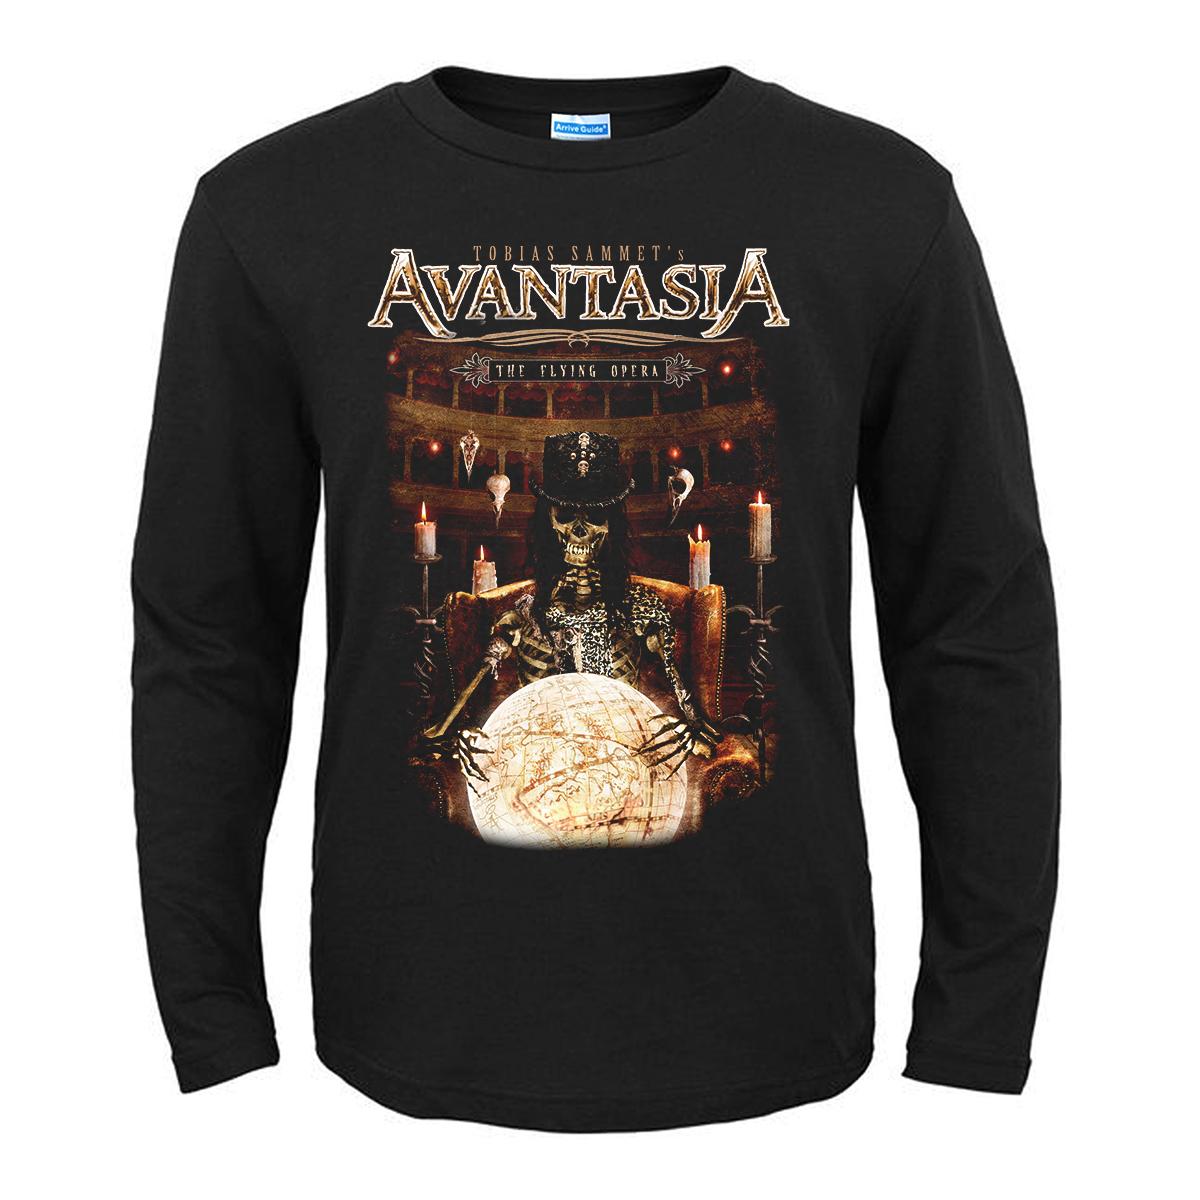 Collectibles T-Shirt Avantasia The Flying Opera